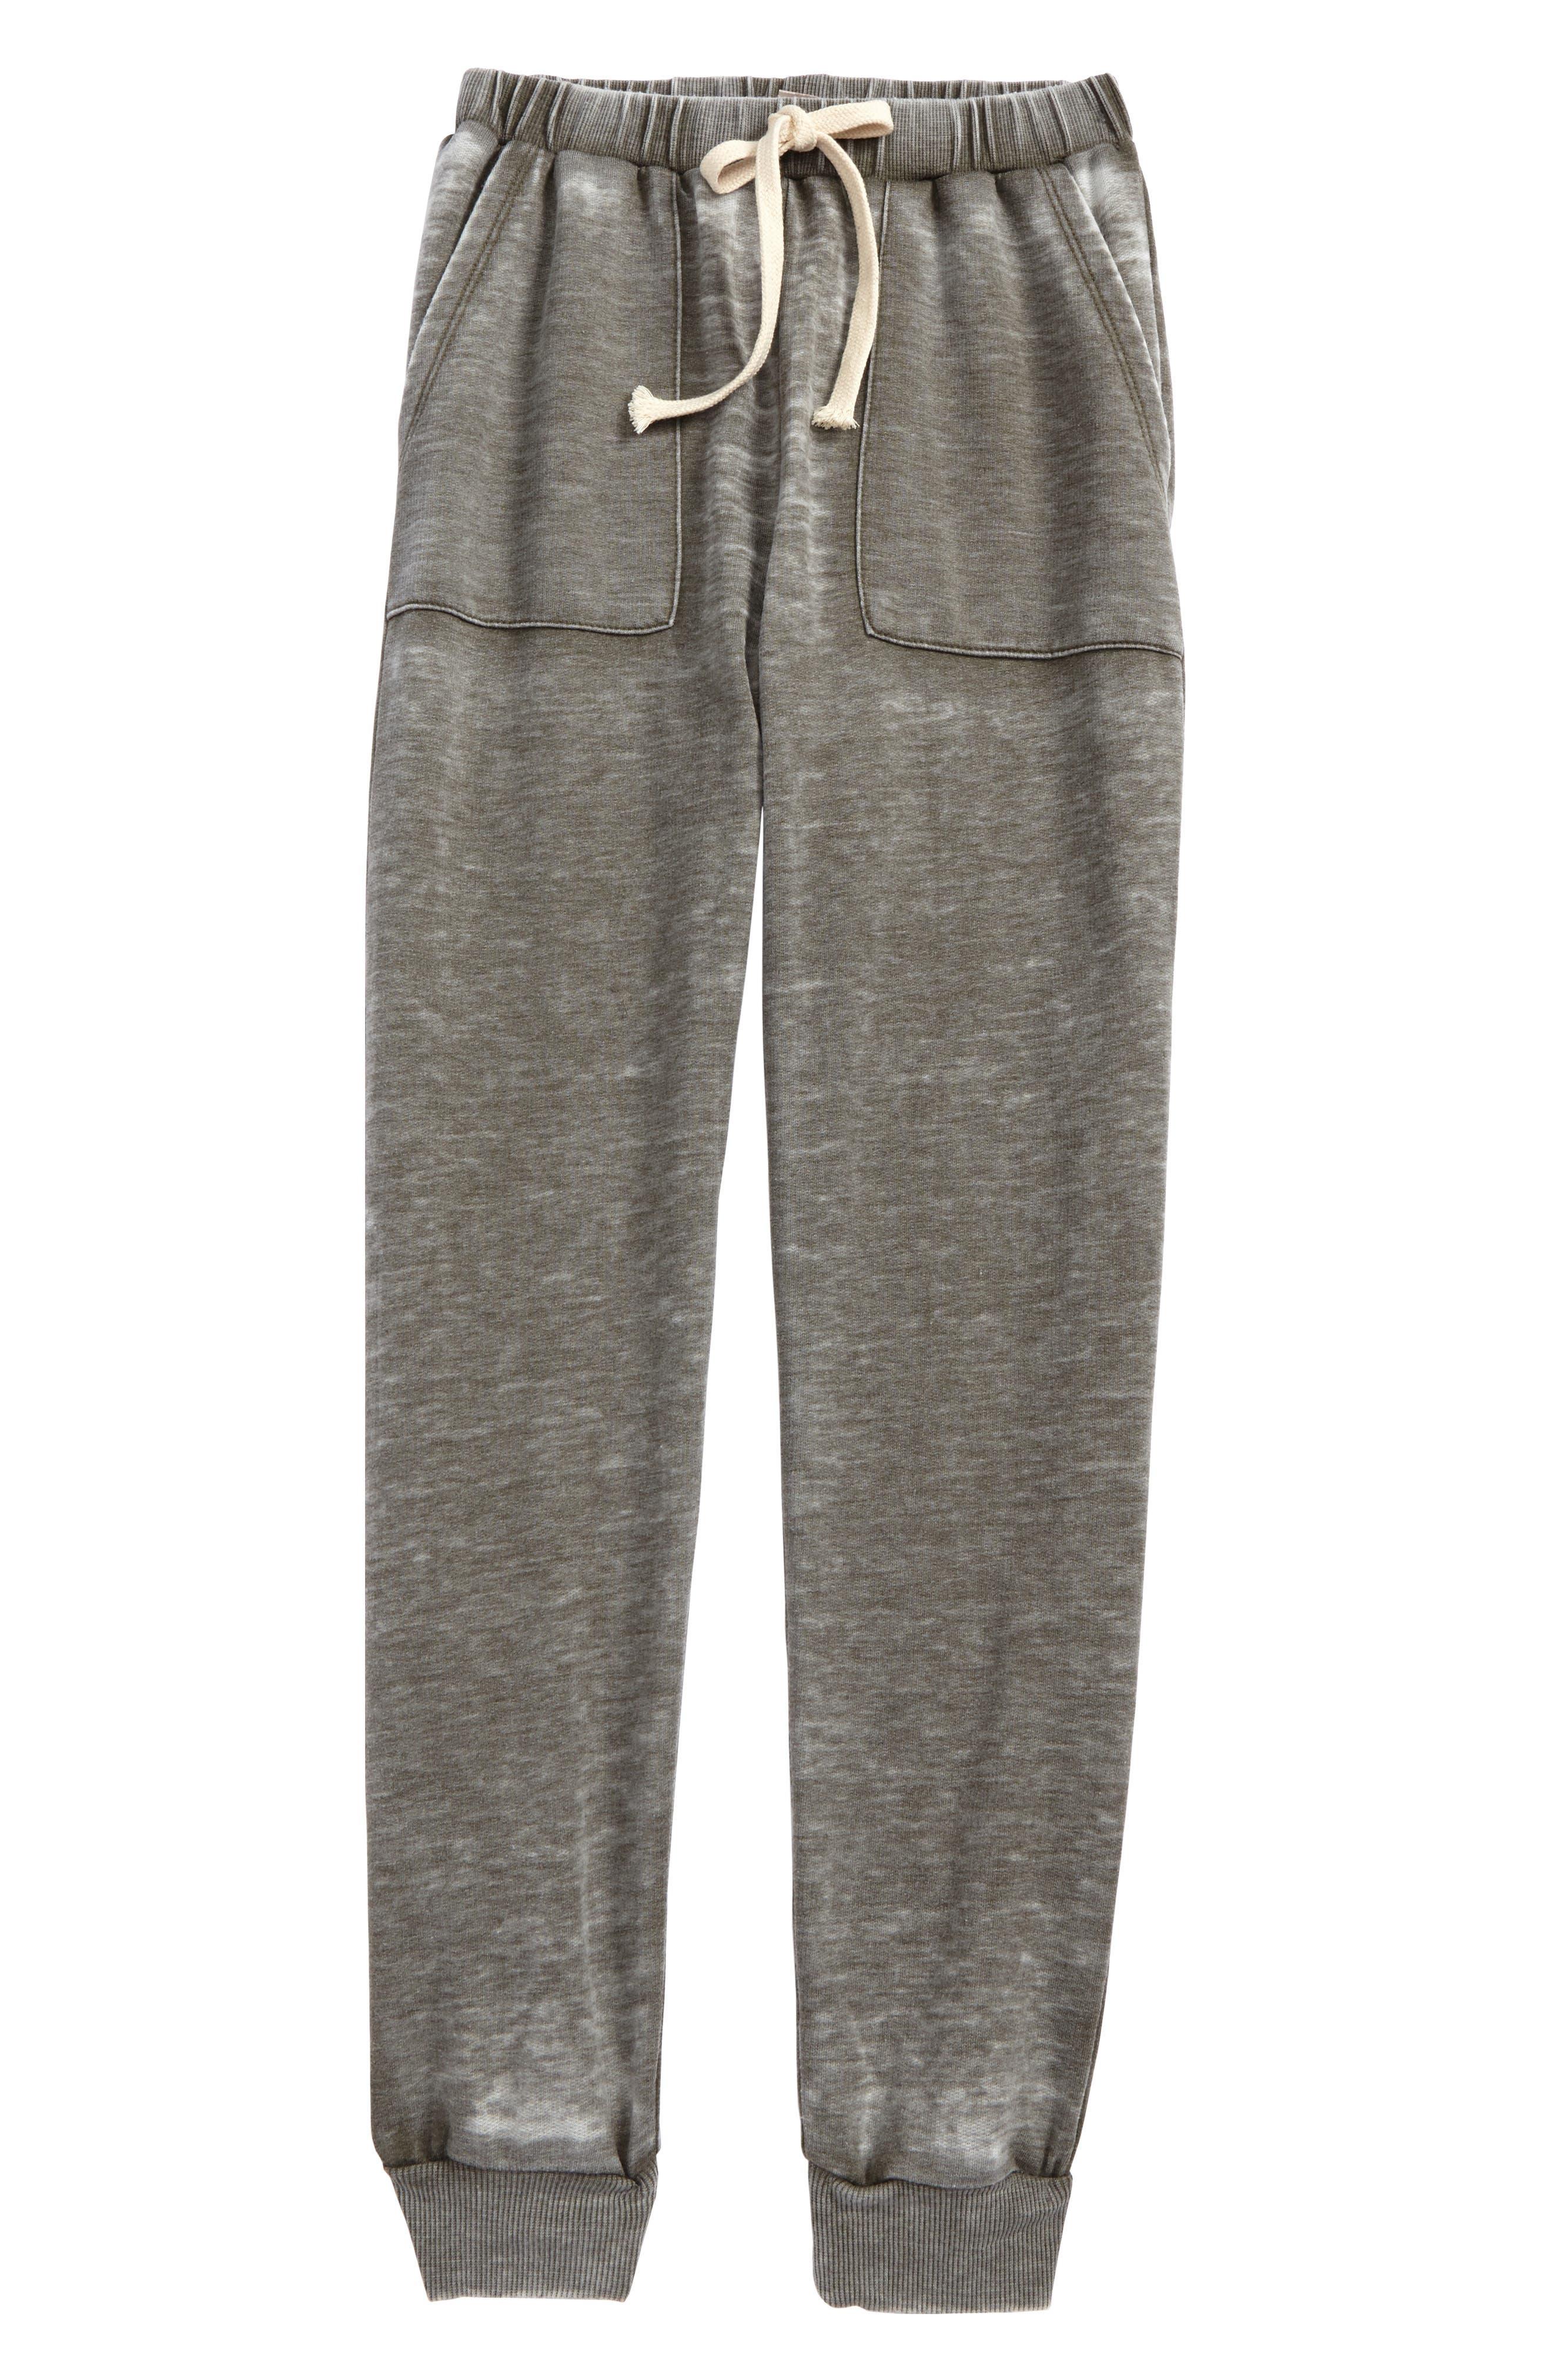 Distressed Sweatpants,                         Main,                         color, Olive